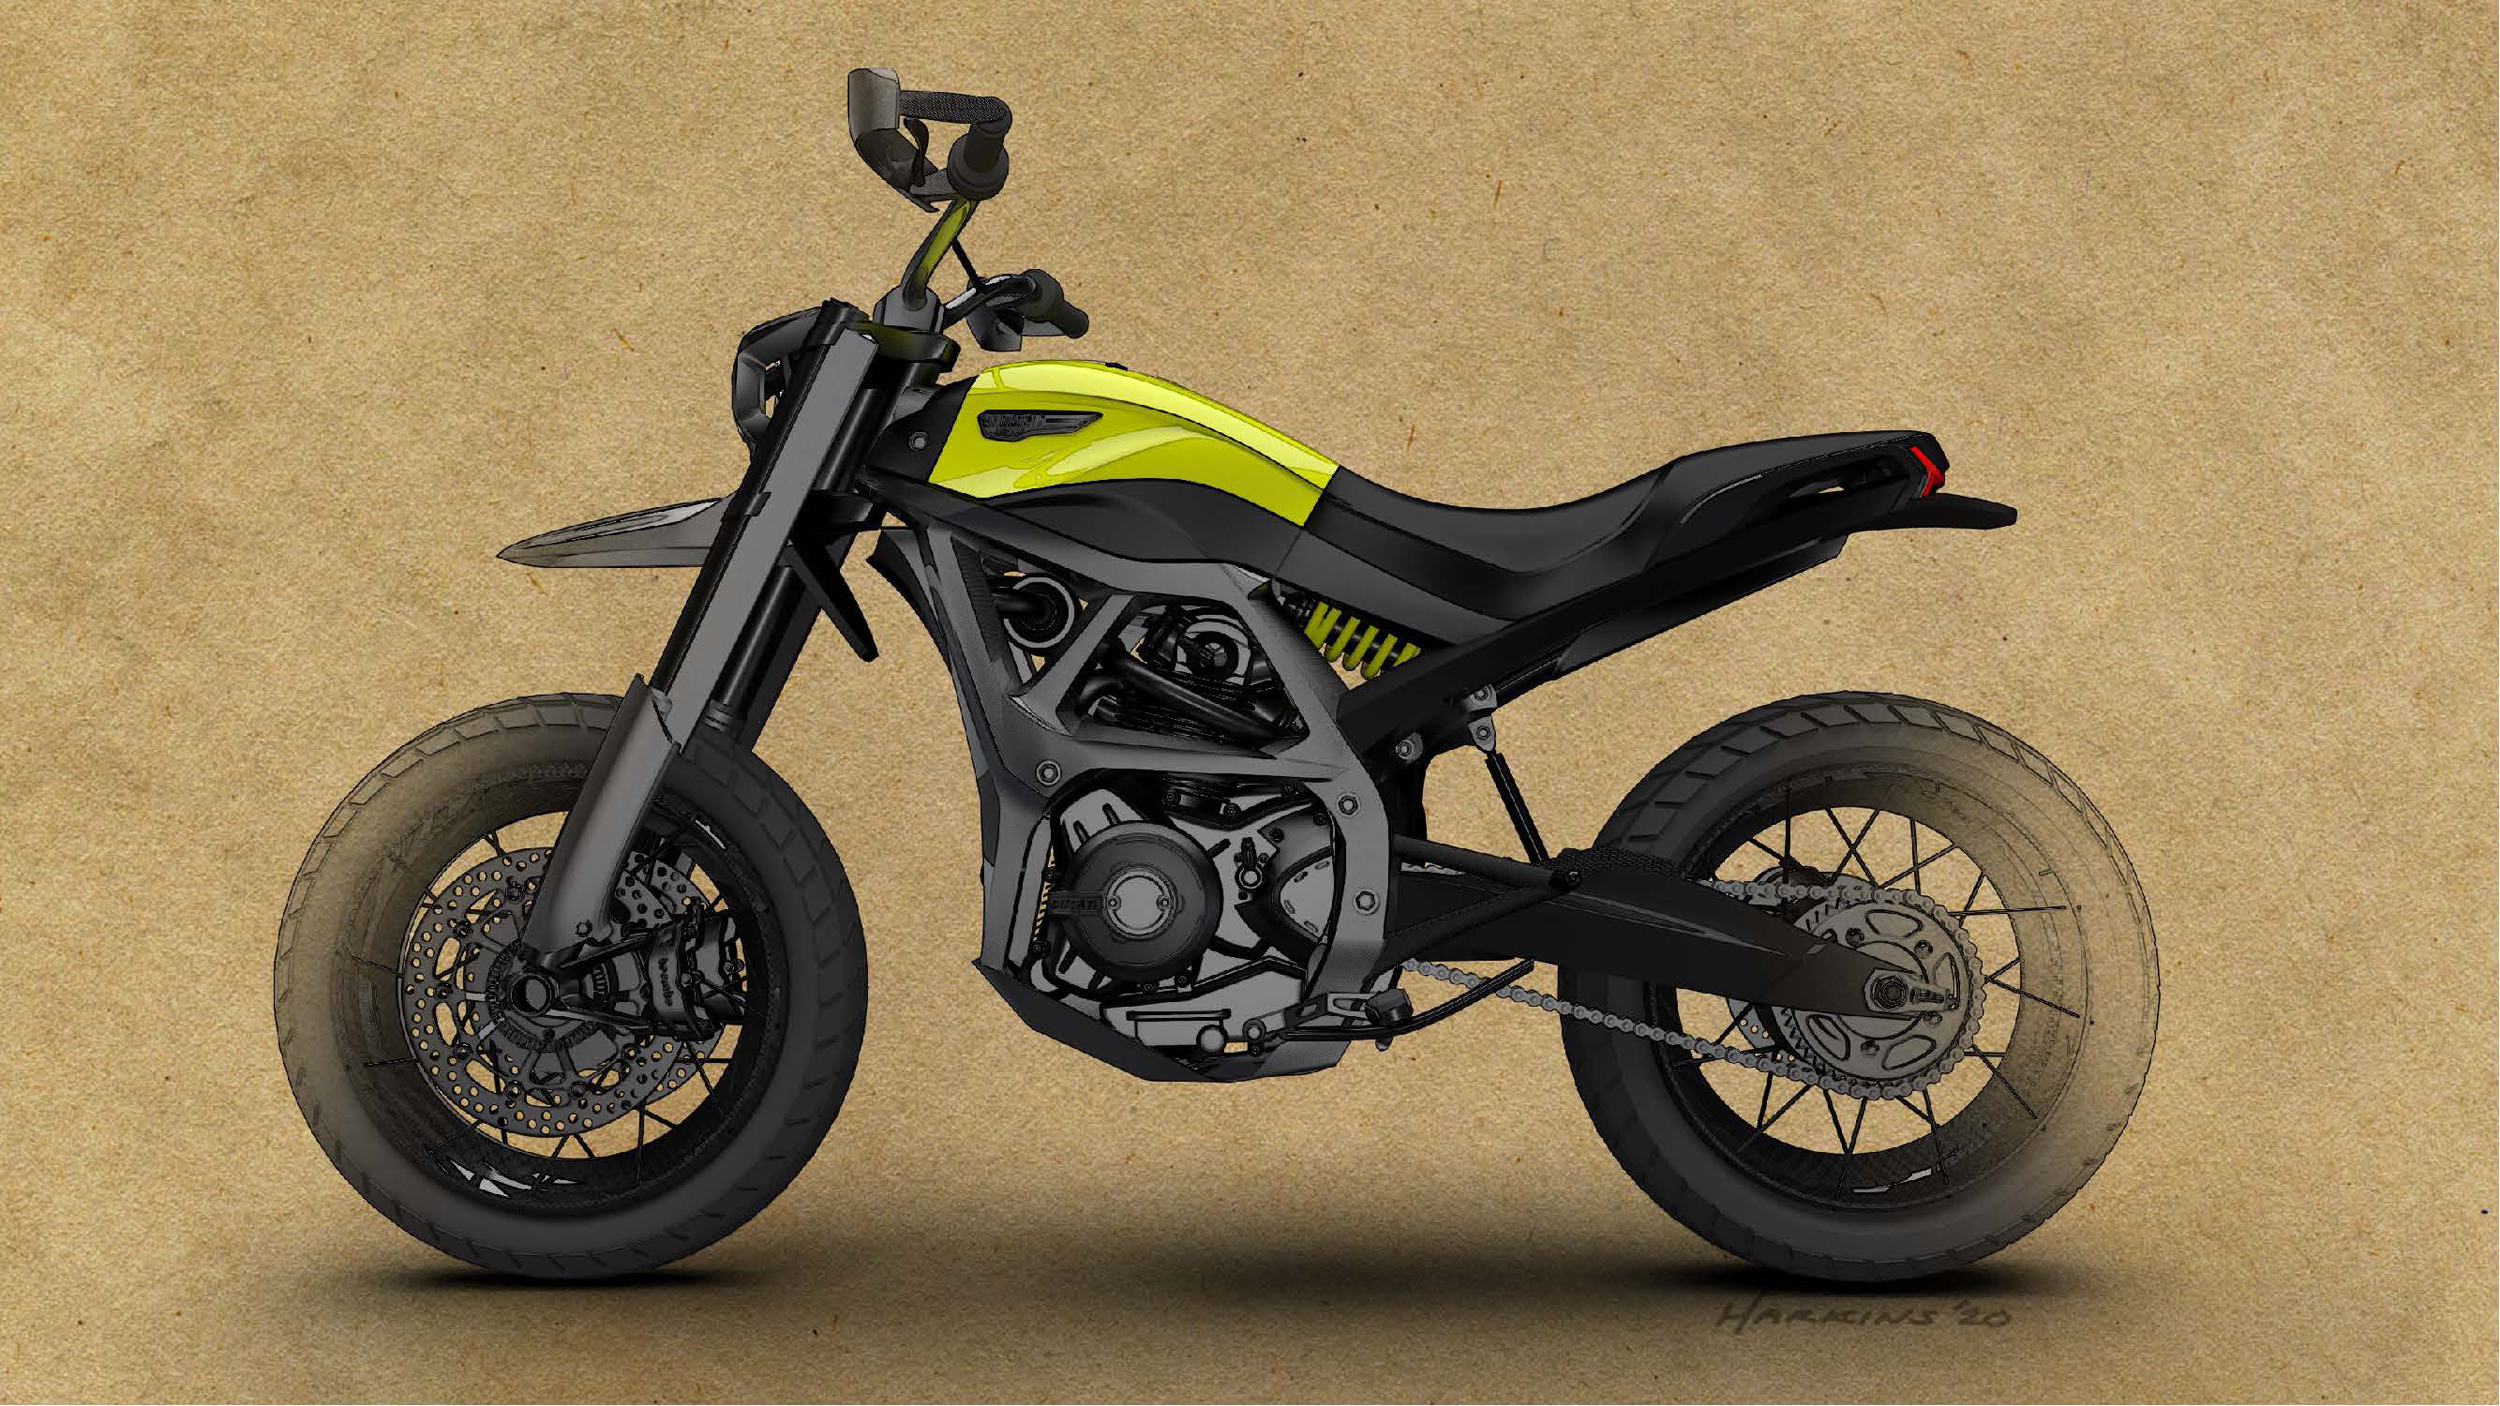 200511 Scrambler Ducati of the future - sketches by Peter Harkins (3)